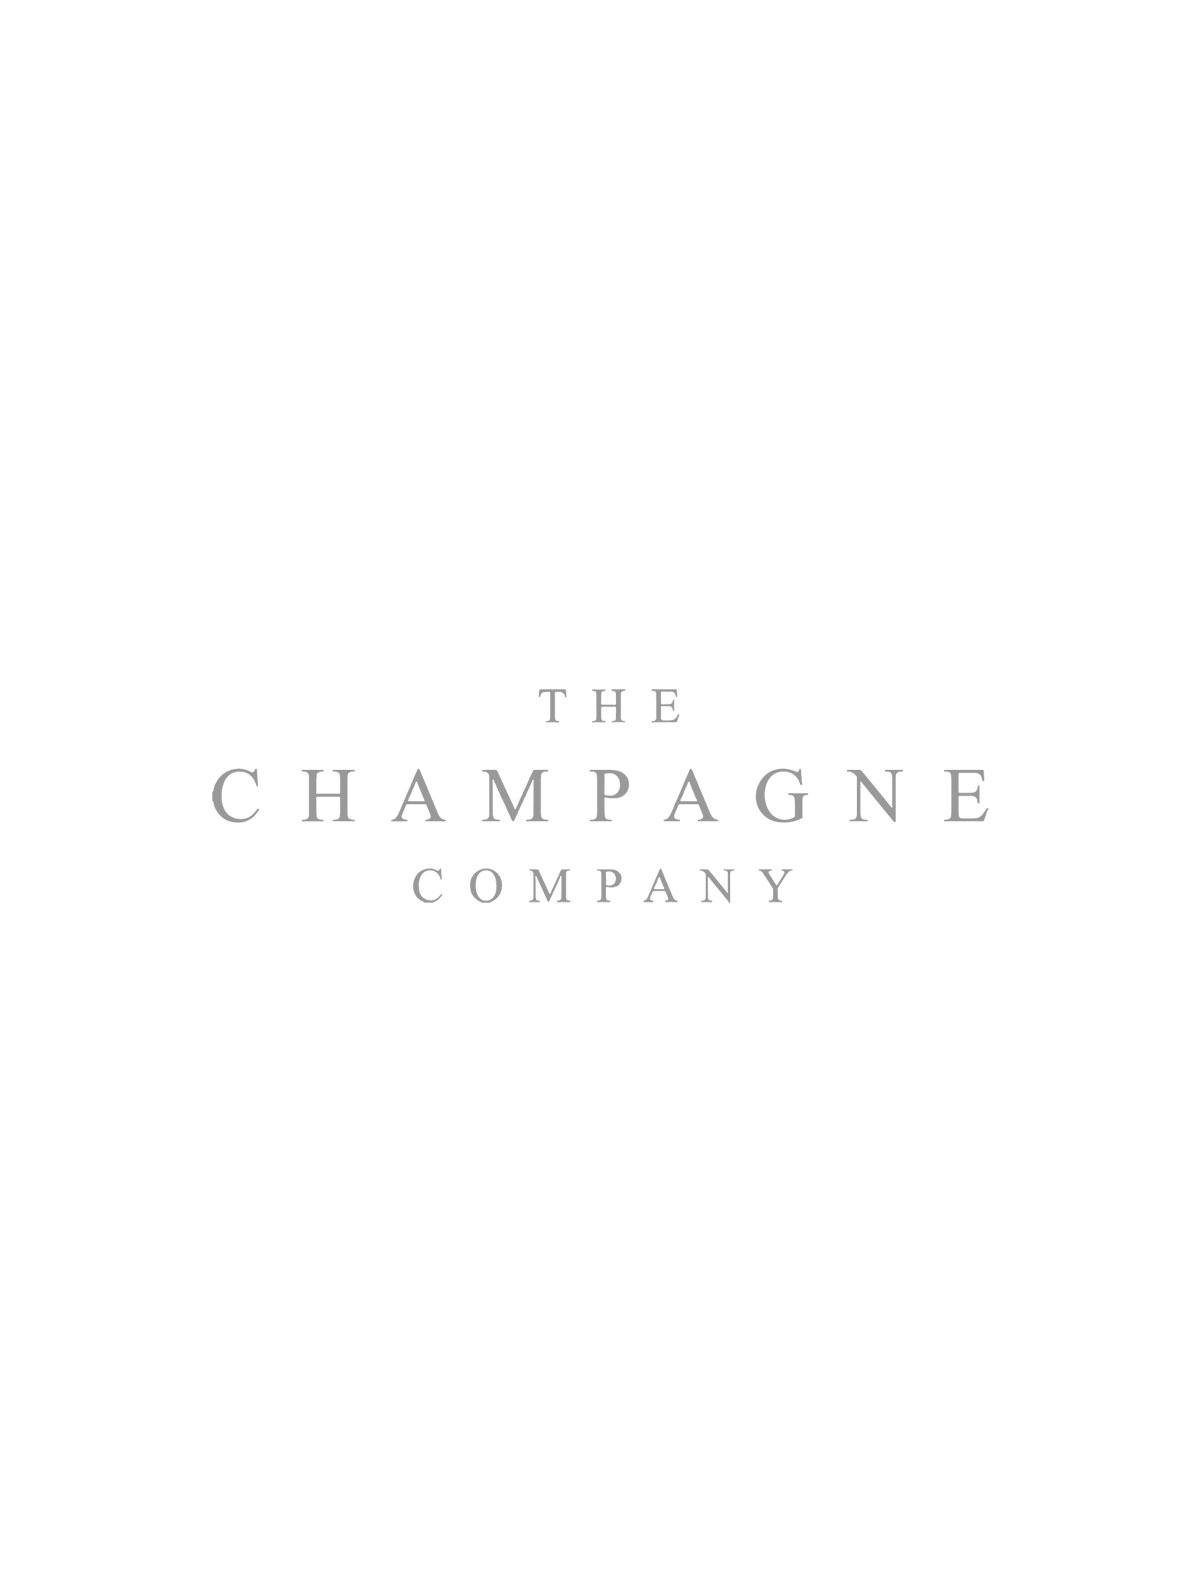 Bottega Rose Gold Spumante Brut - Vino Dei Poeti Rose Gold 75cl